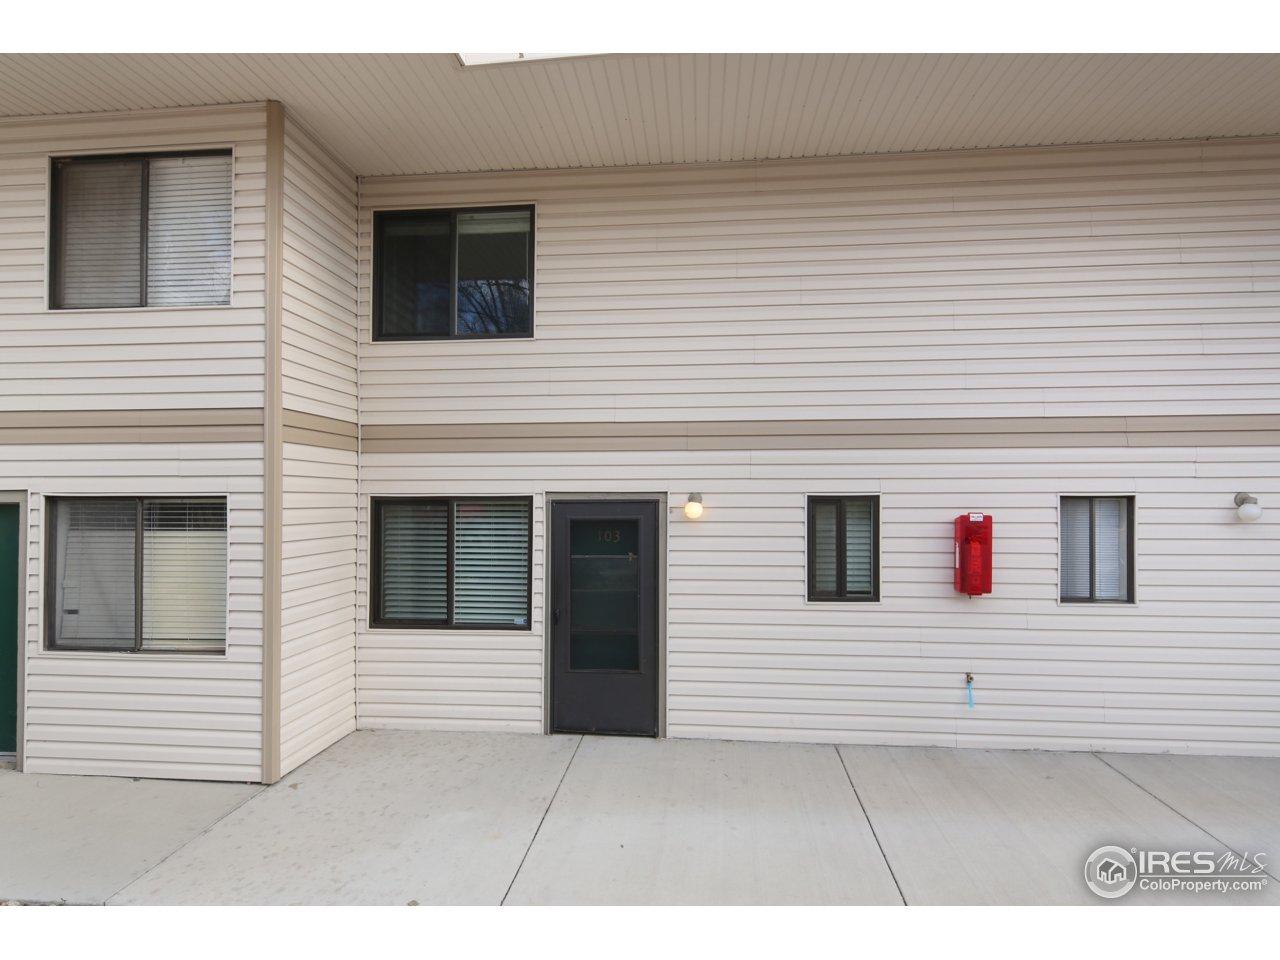 1705 Heatheridge Rd L-103, Fort Collins CO 80526